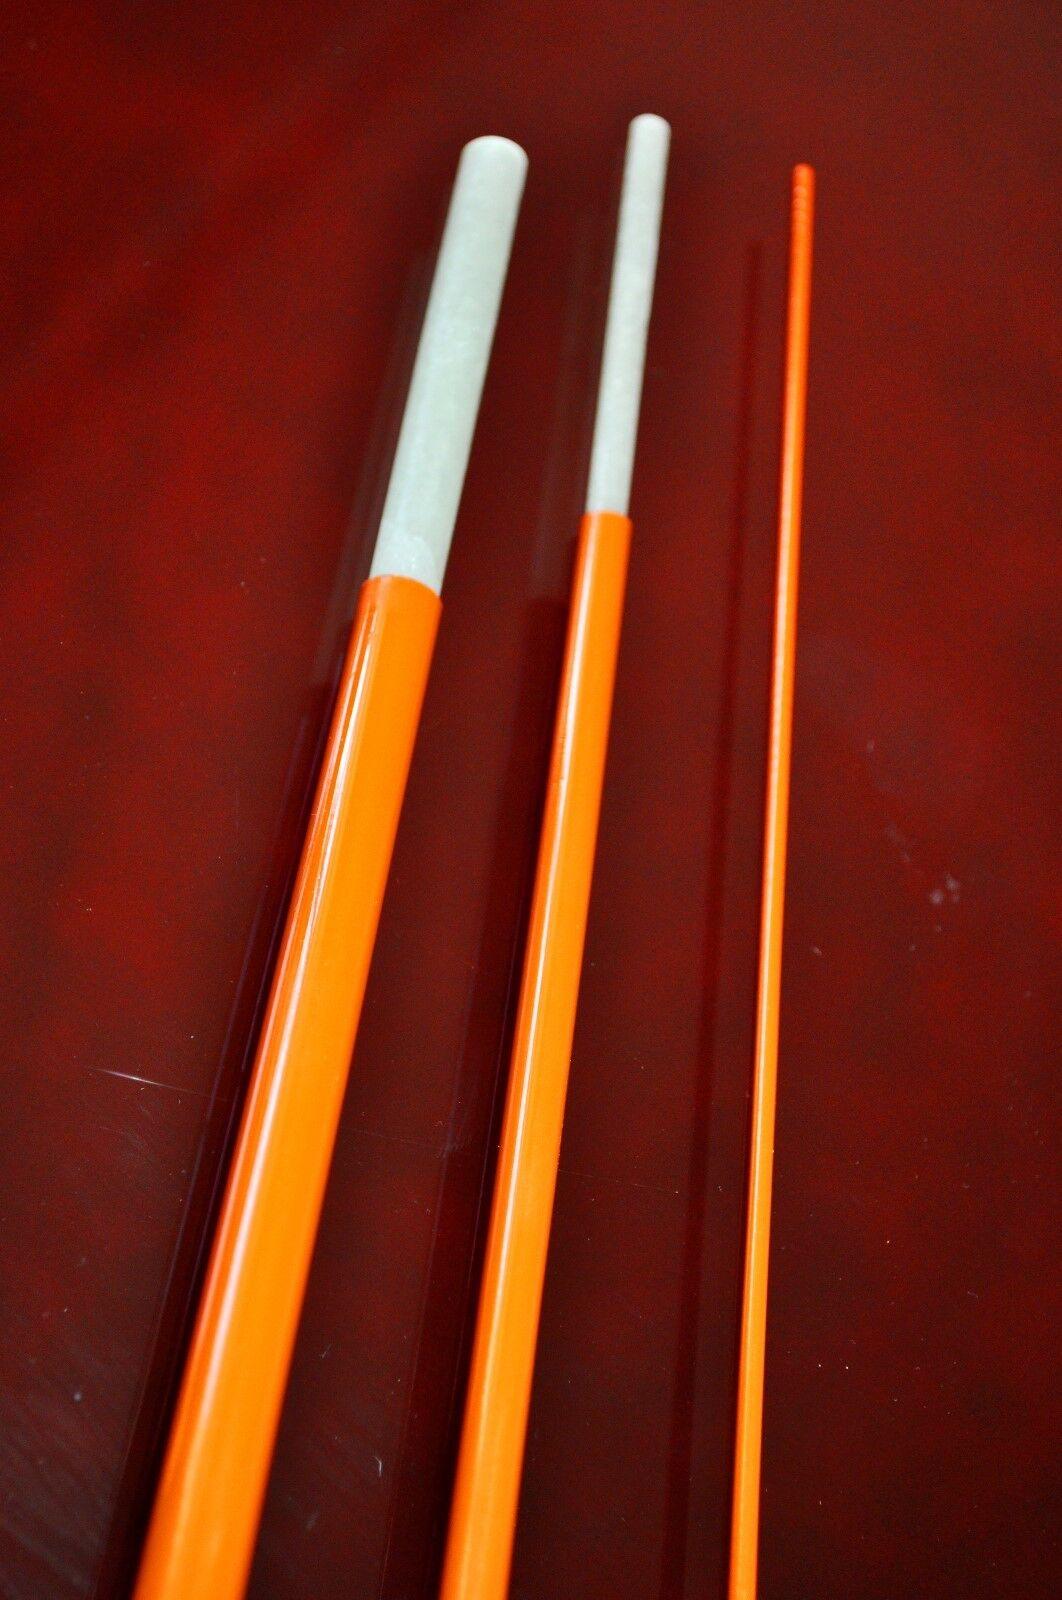 Bloke XLSG Fibreglass fly rod blank 7' 3-piece 3wt. Hot 0range